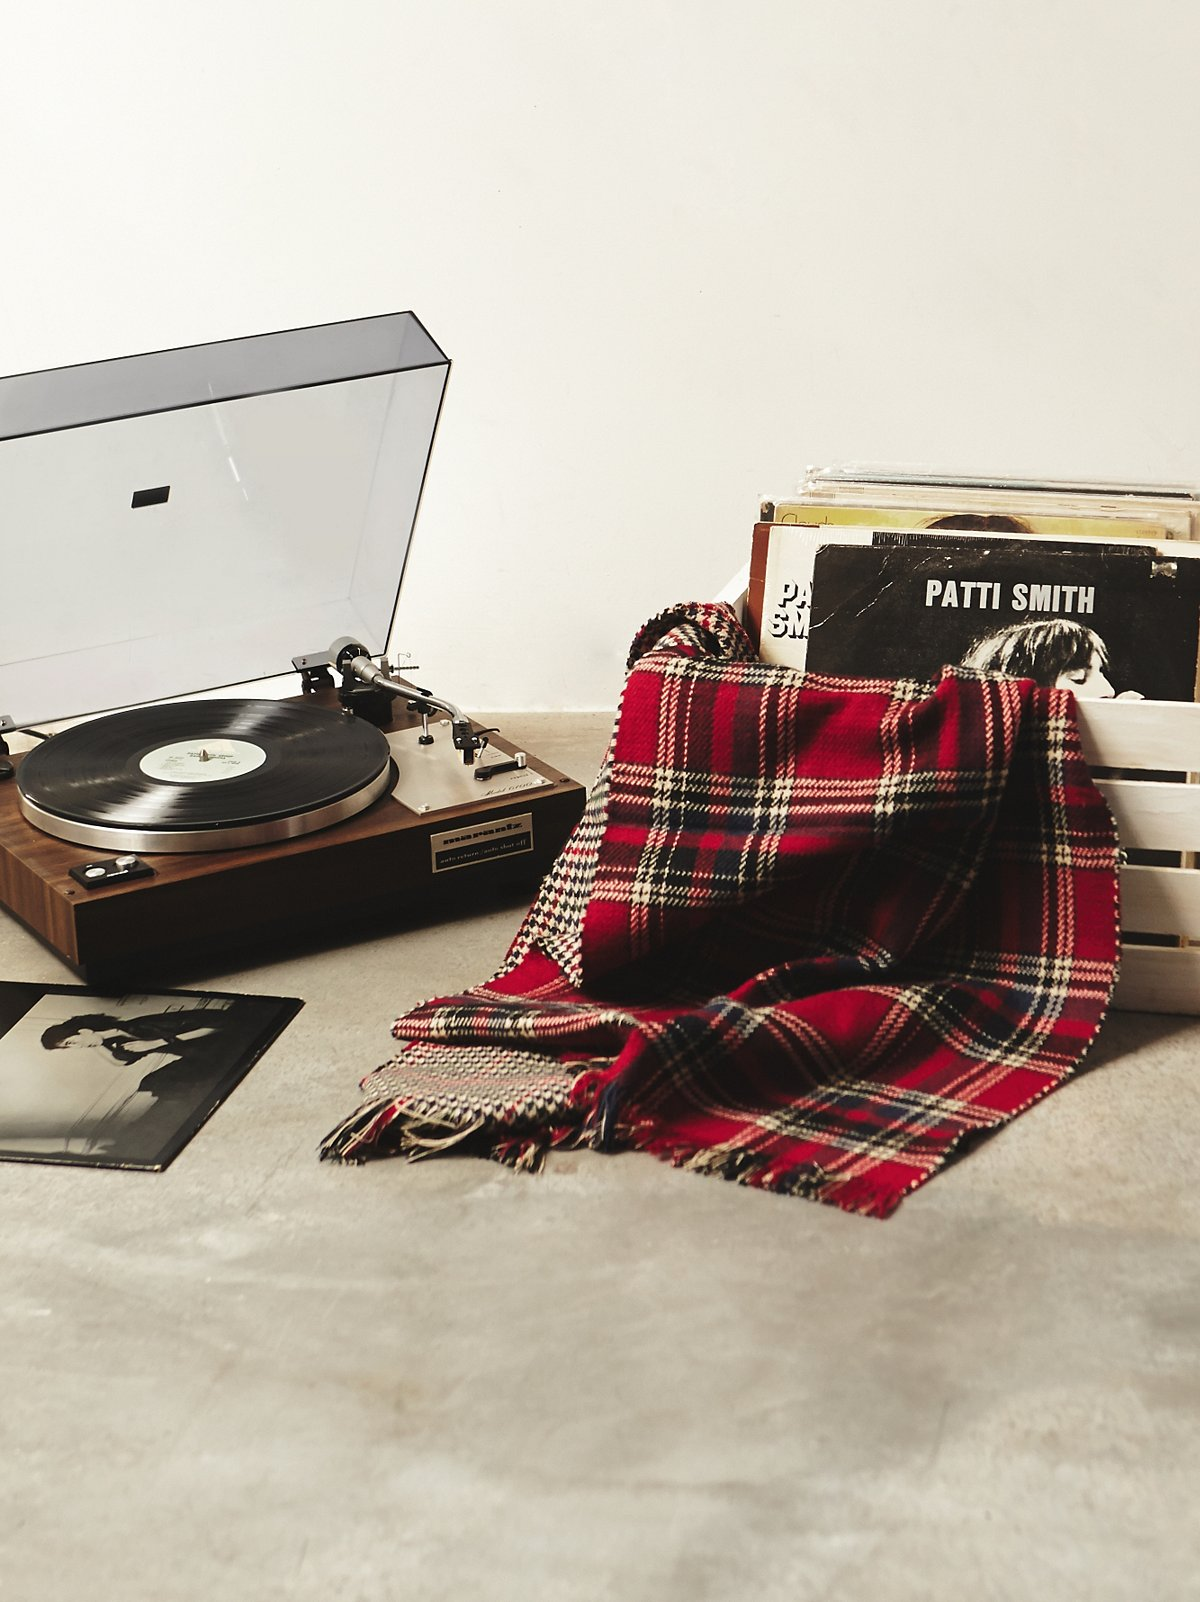 Vintage Patti Smith Record Collection